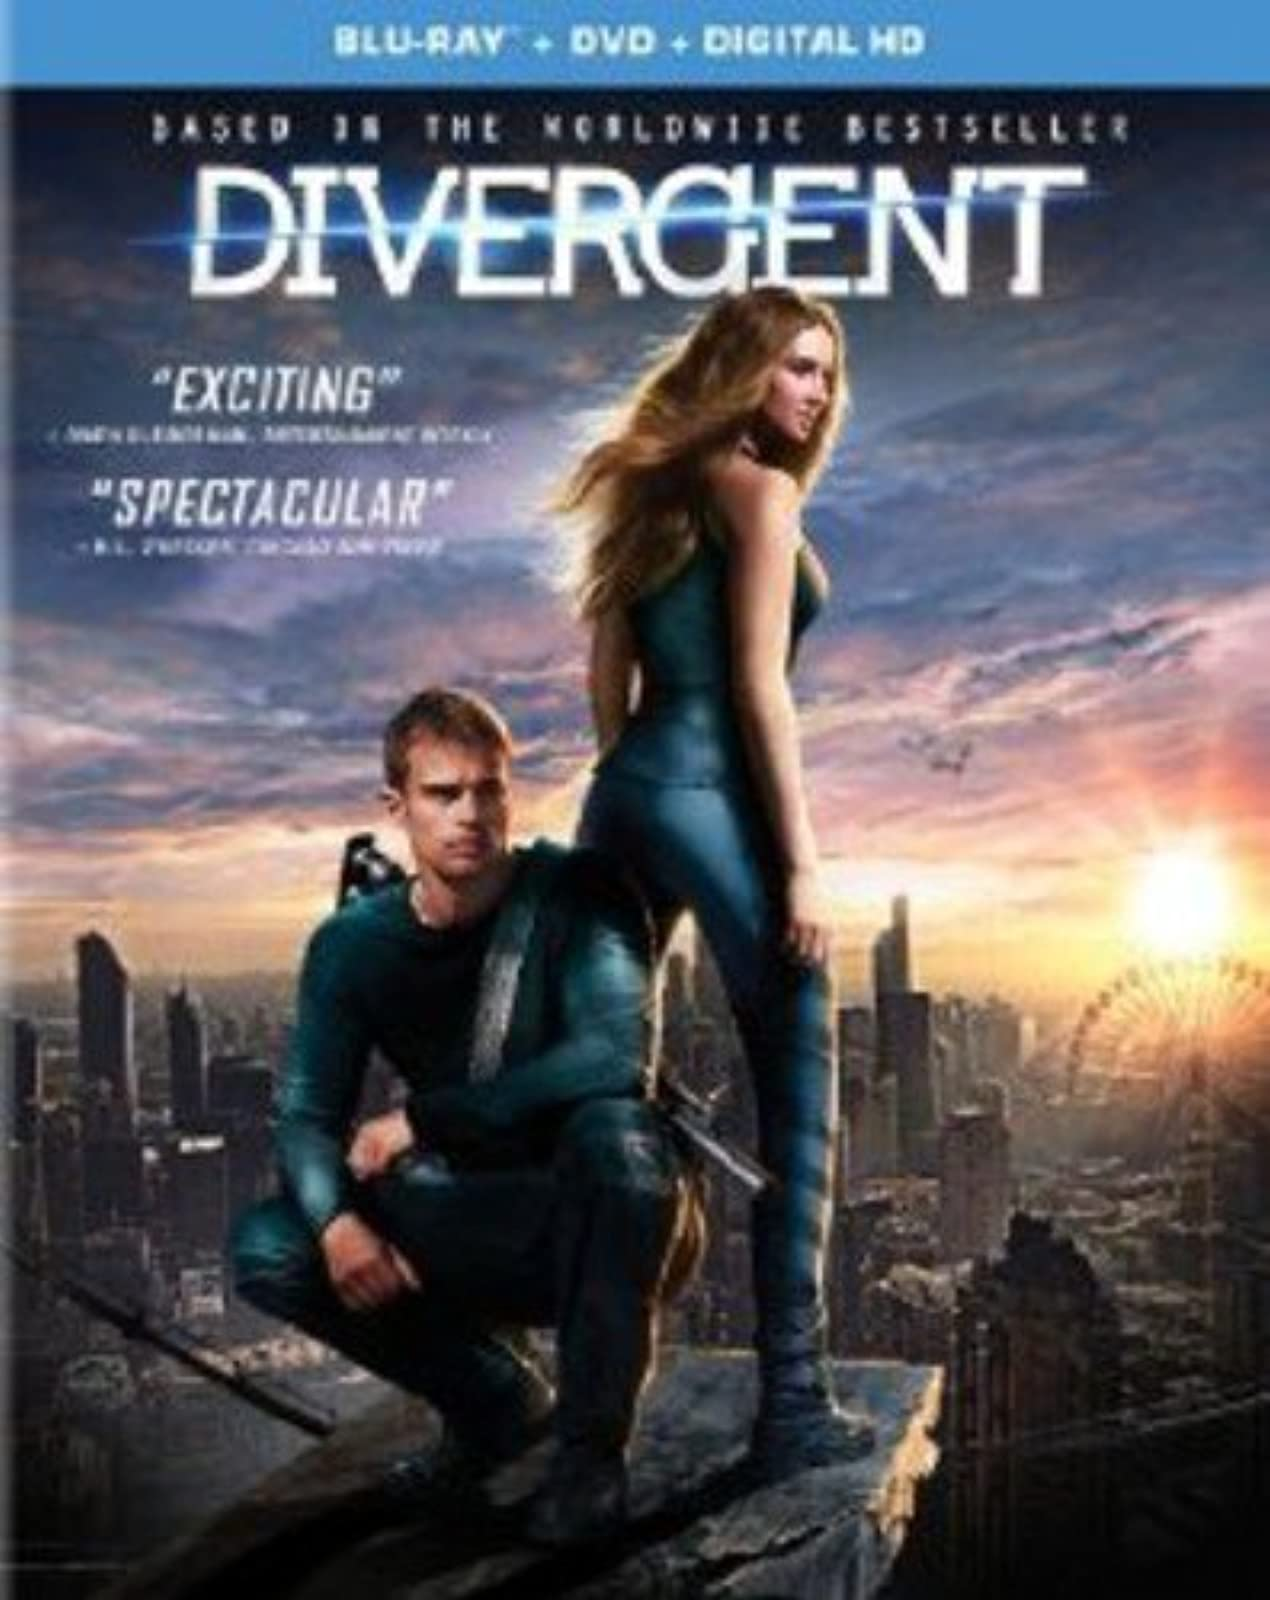 Divergent Digital HD On Blu-Ray With Shailene Woodley